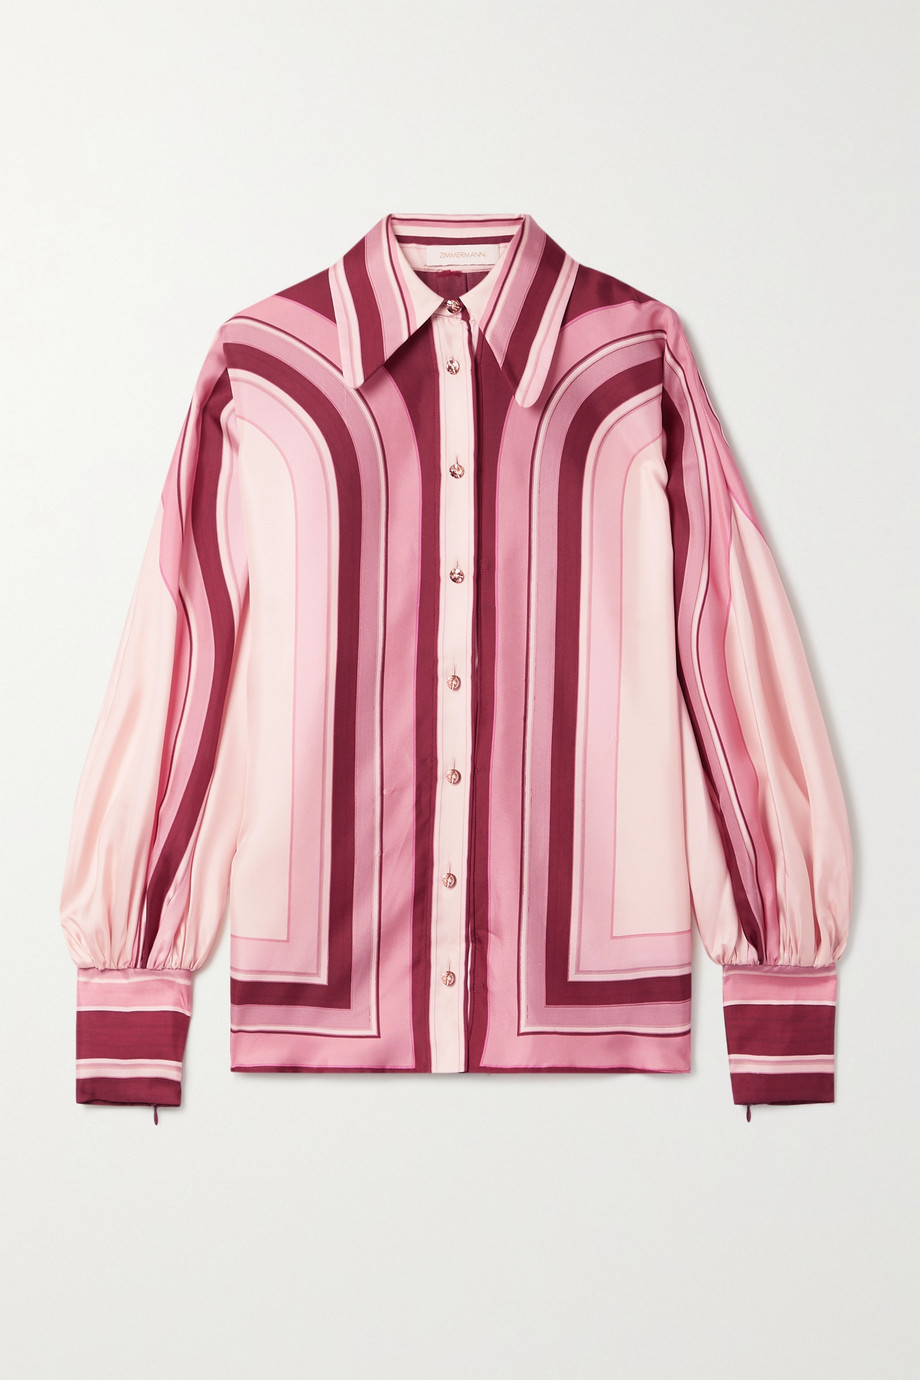 Zimmermann Concert striped silk-twill shirt